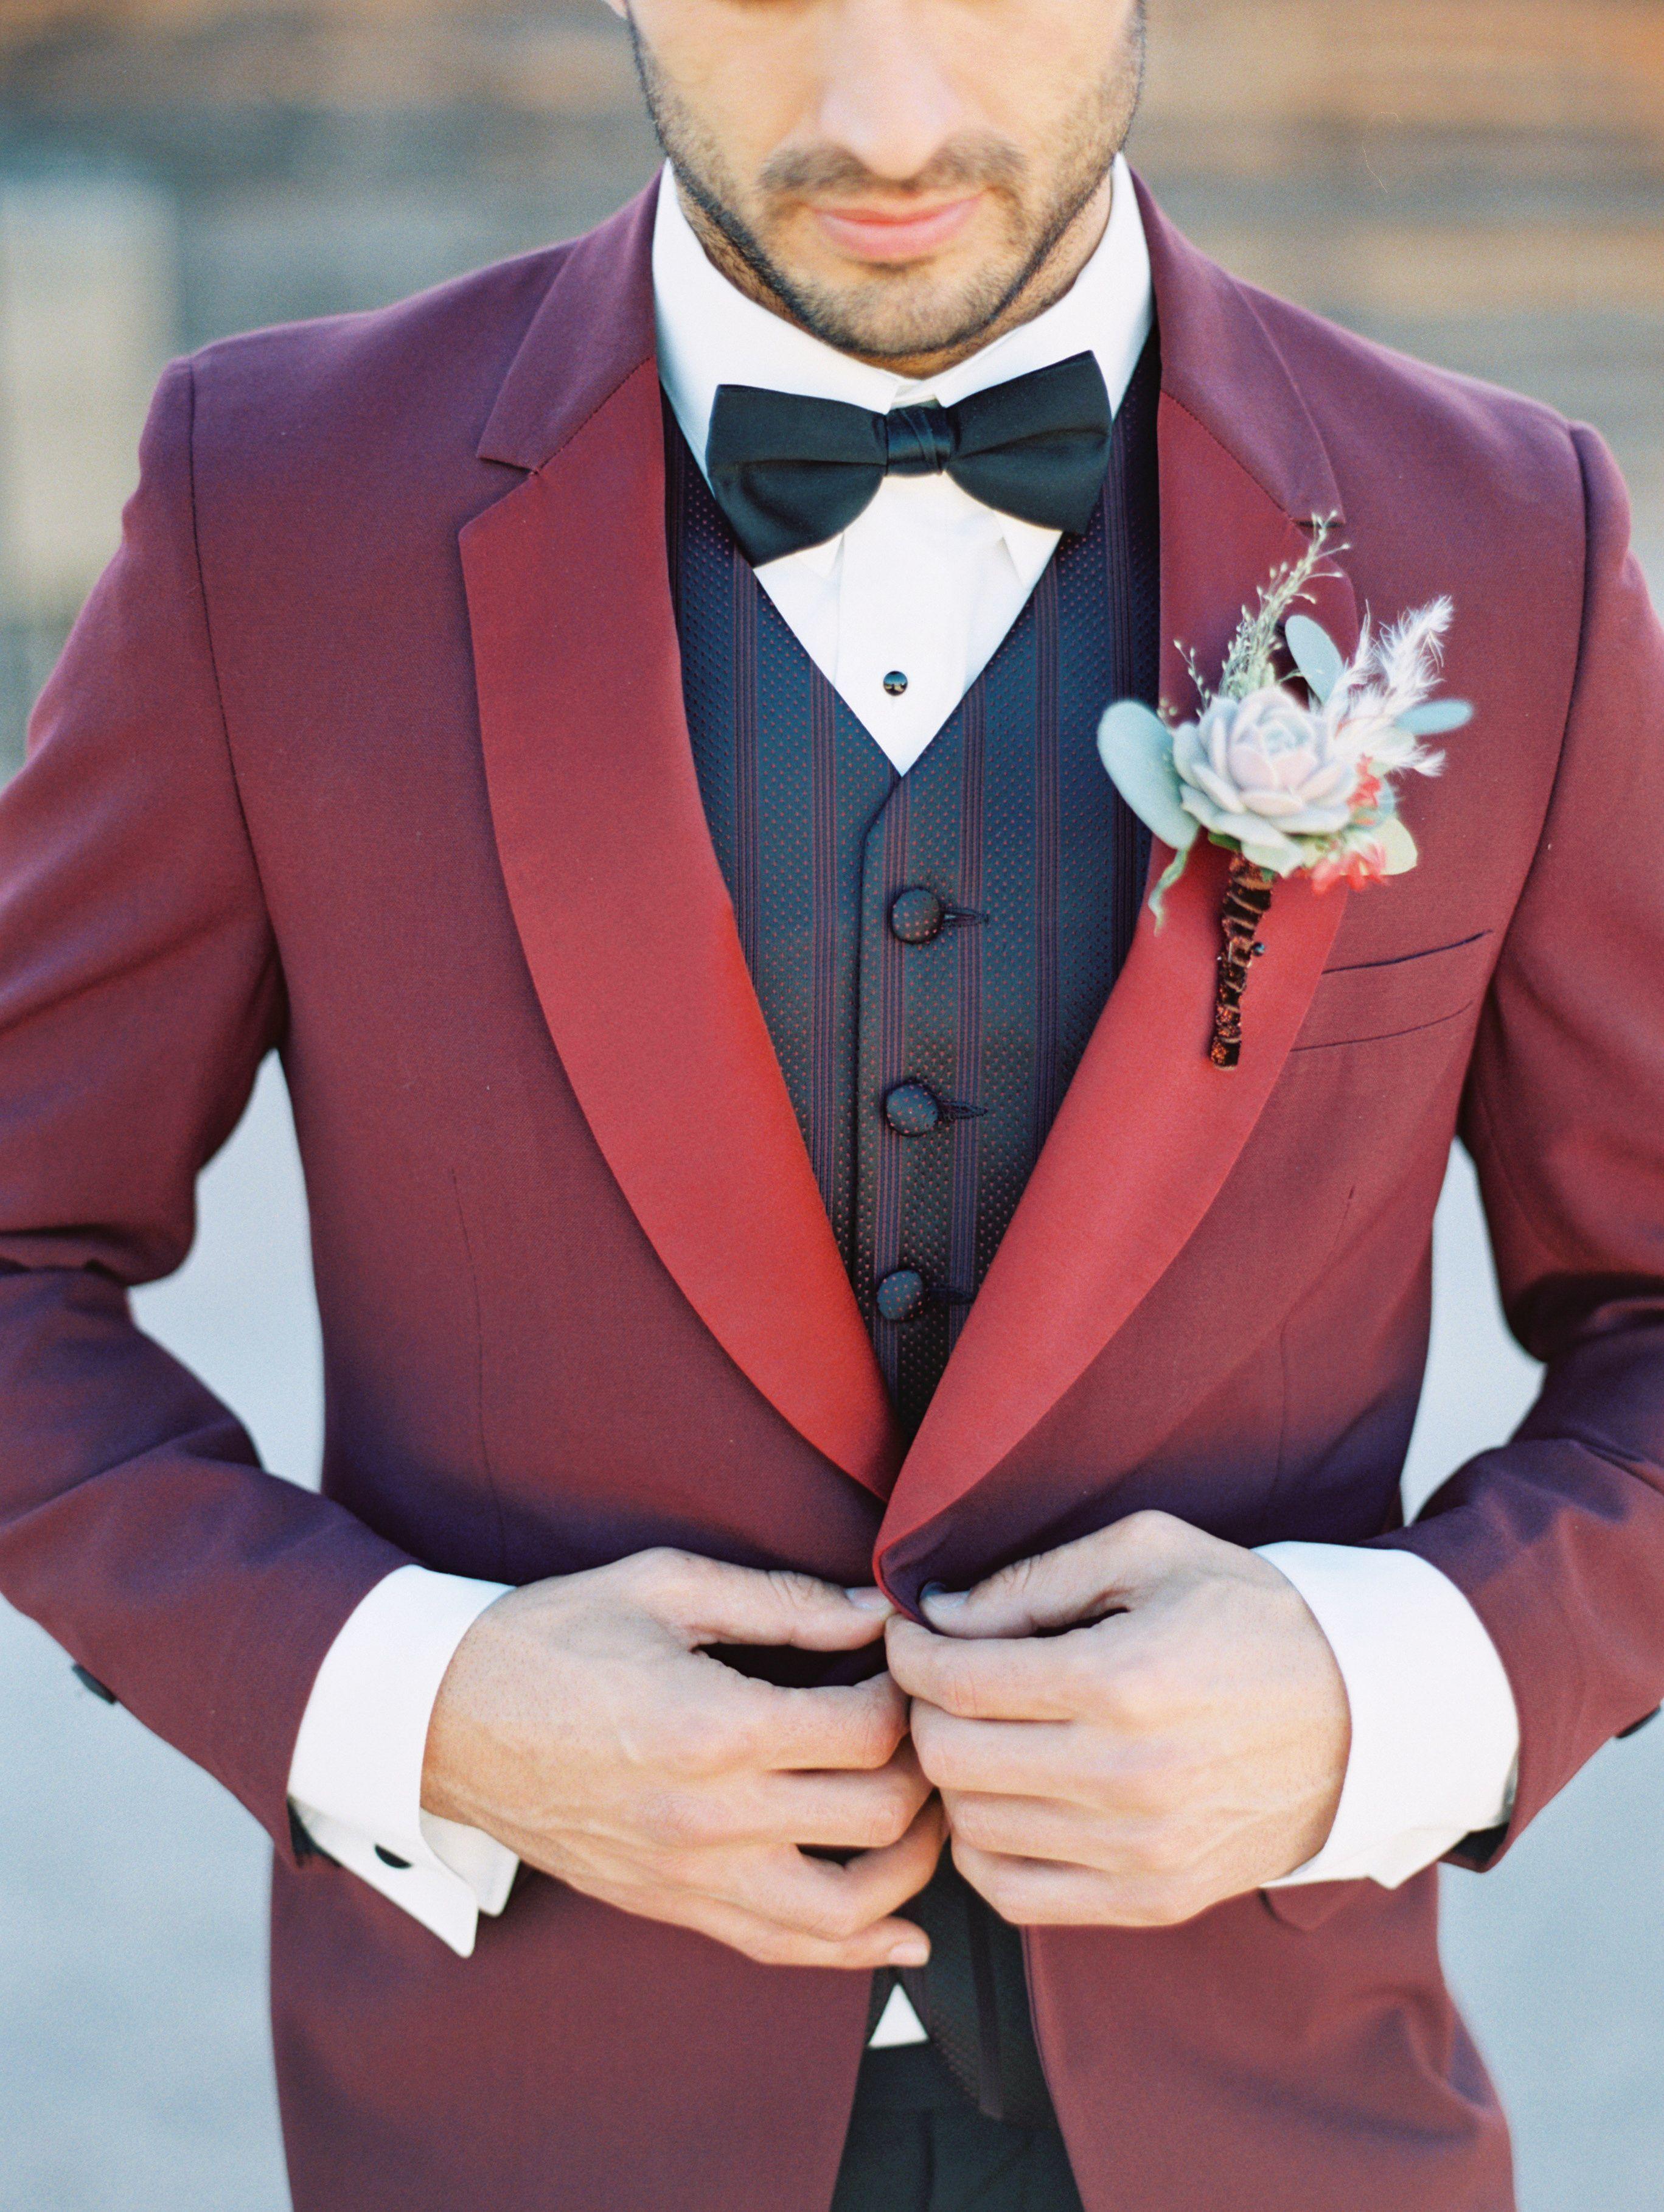 25+ Marvelous Red Black and White Wedding Tuxedo Ideas | Red black ...